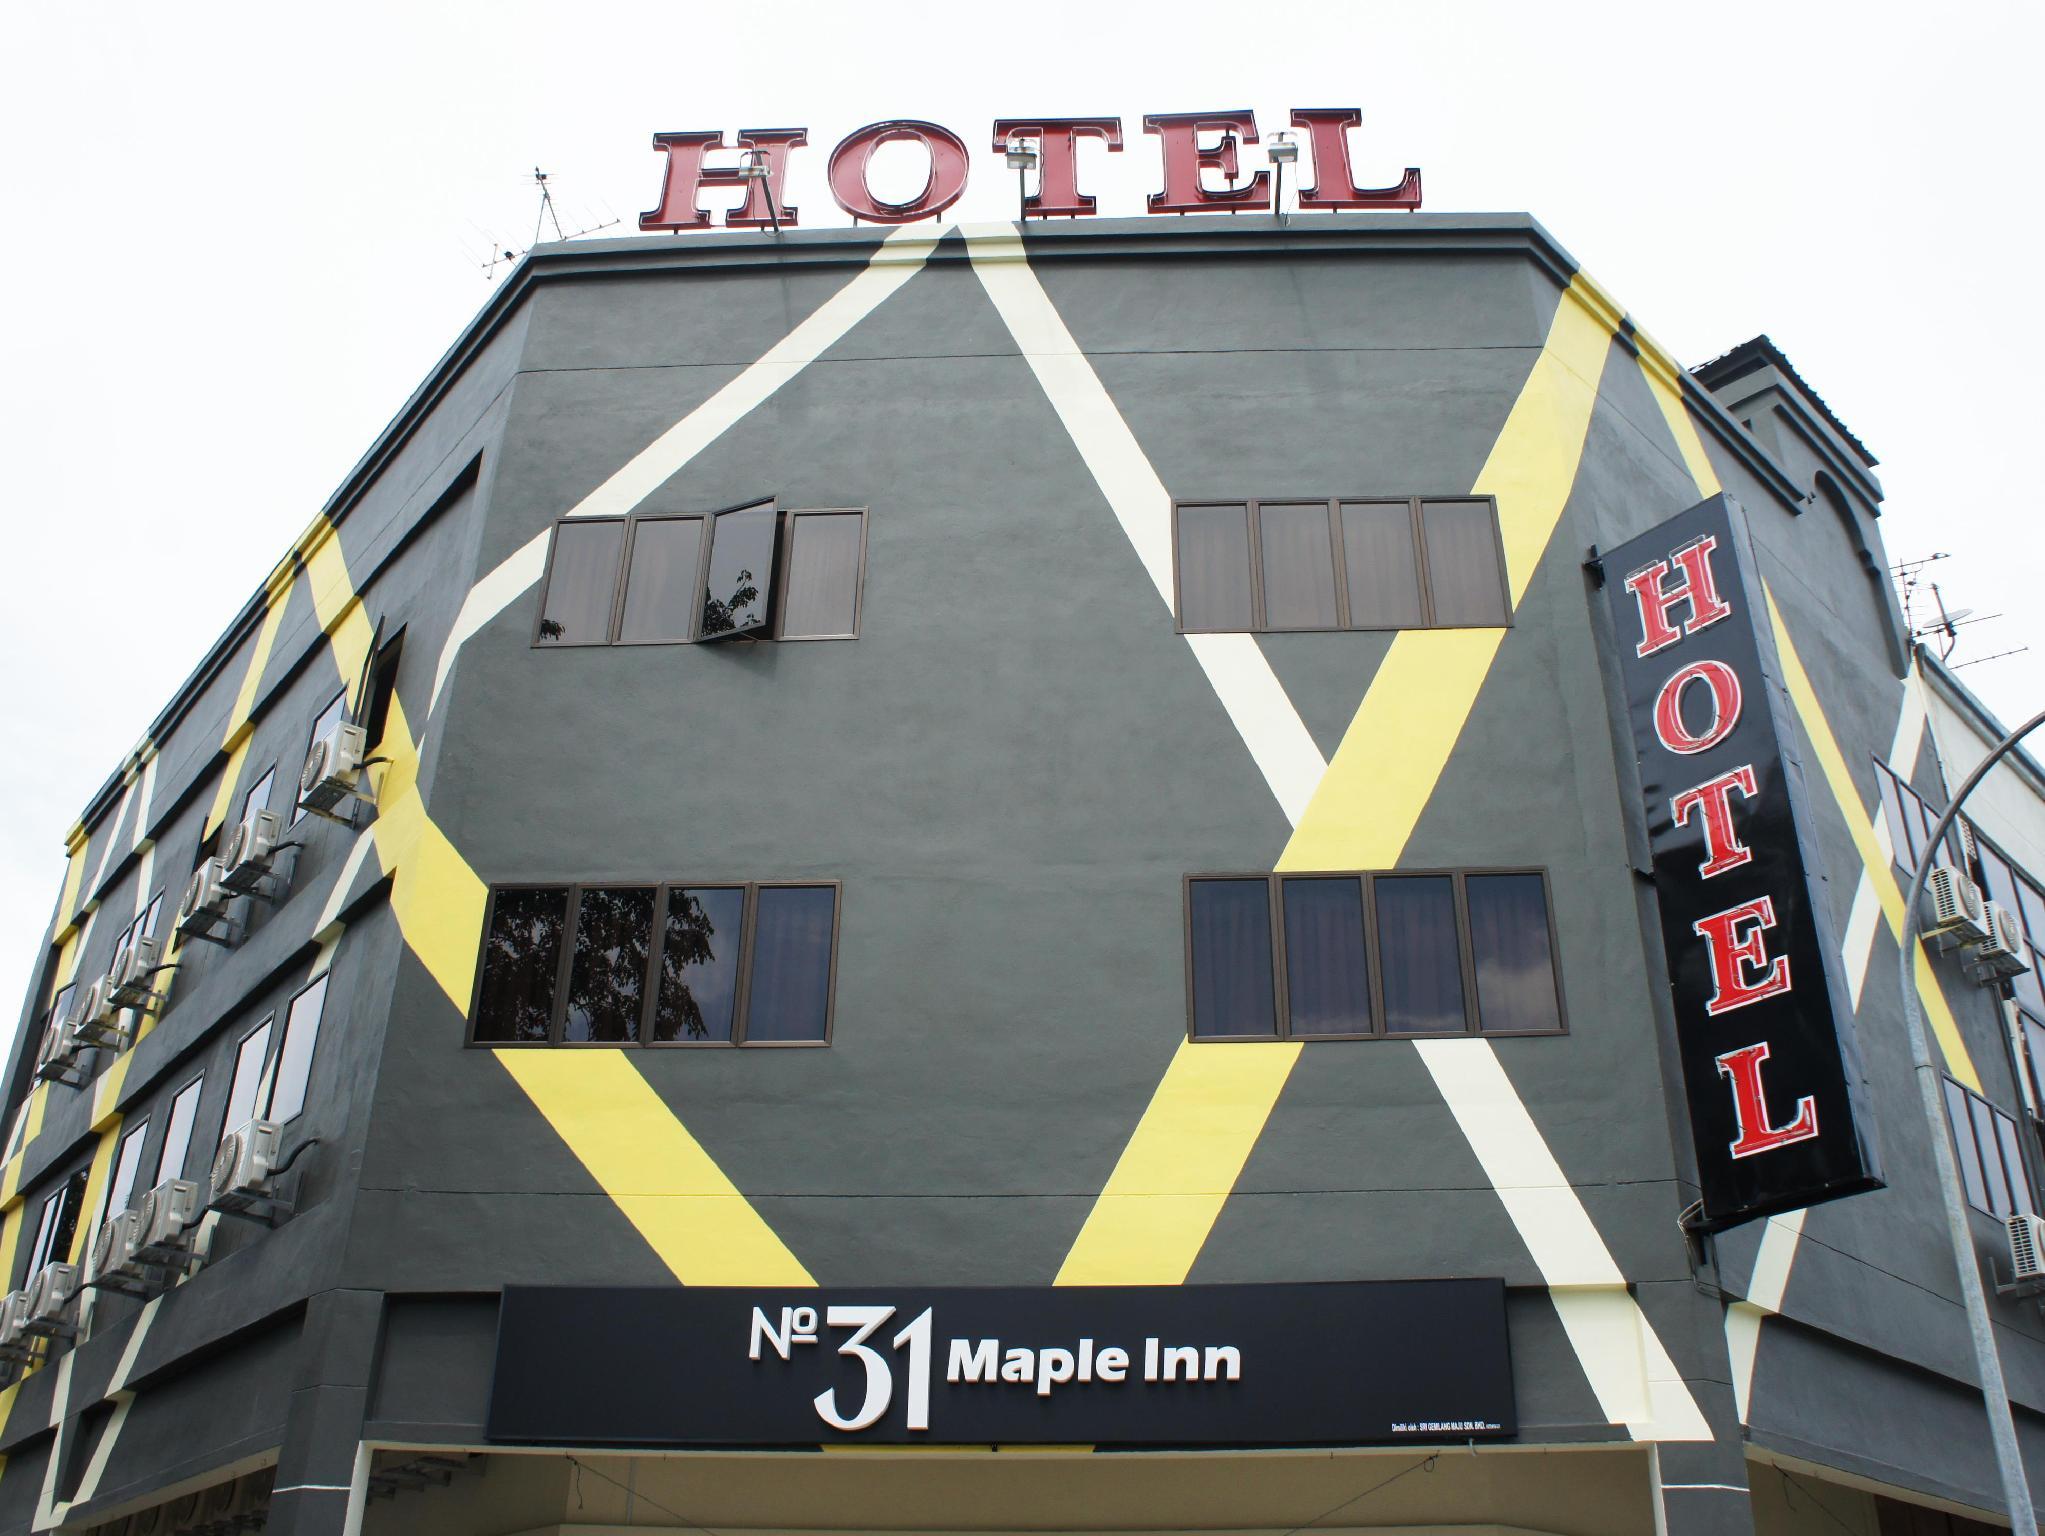 No.31 Maple Inn, Seberang Perai Selatan